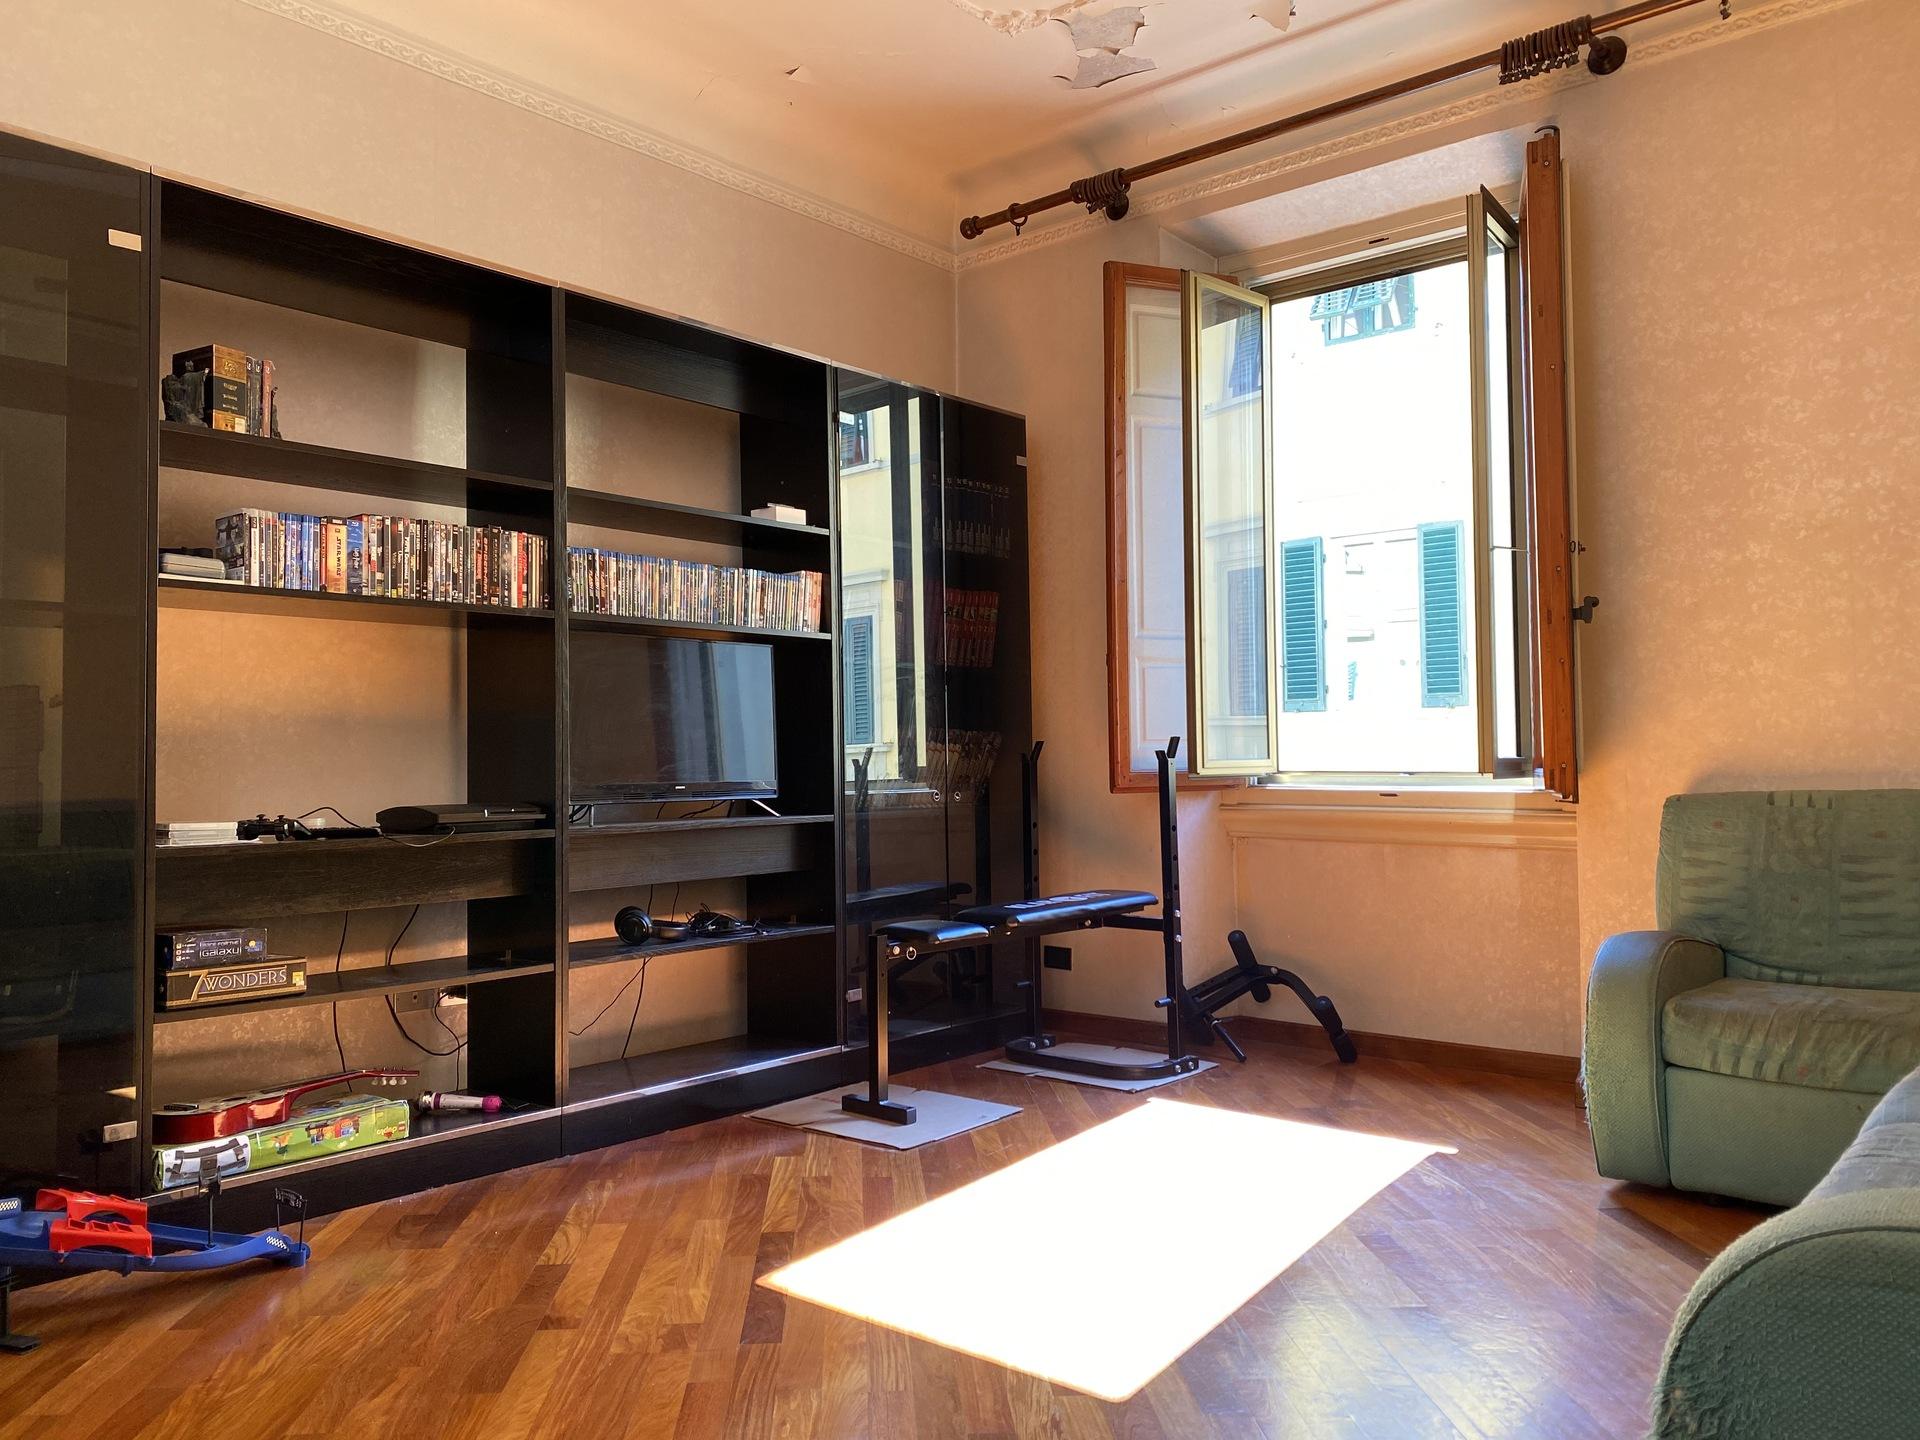 Apartment in Via Andrea del Sarto plan